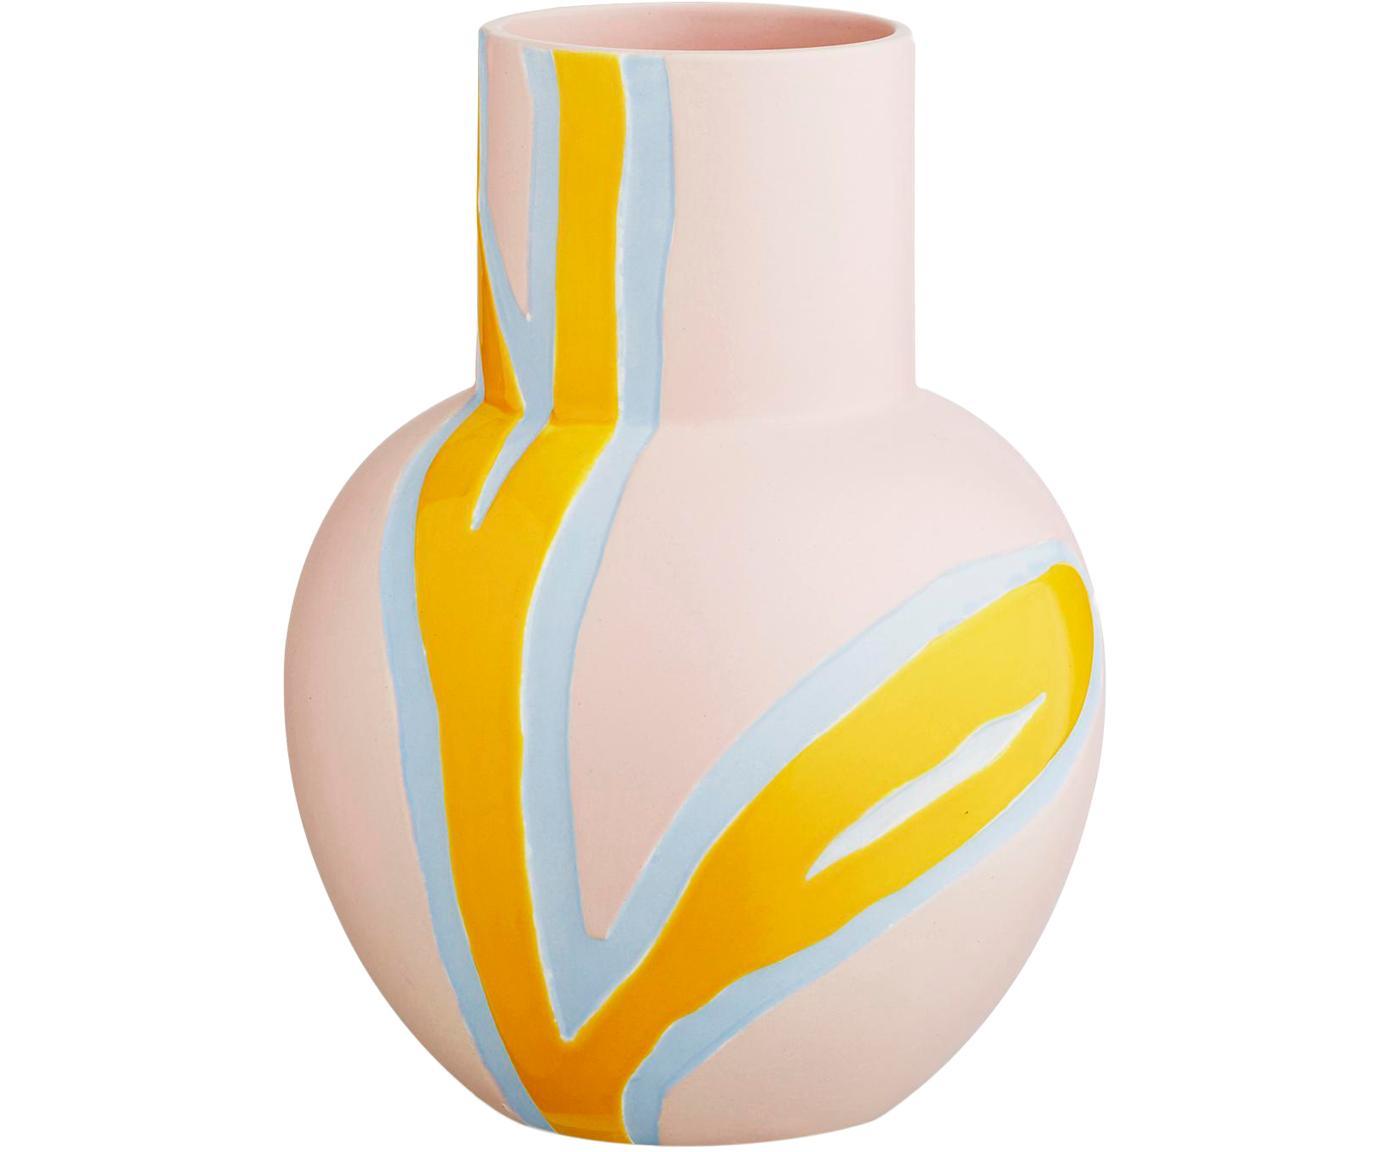 Handgefertigte Design-Vase Fiora, Porzellan, Rosa, Gelb, Hellblau, 19 x 25 cm